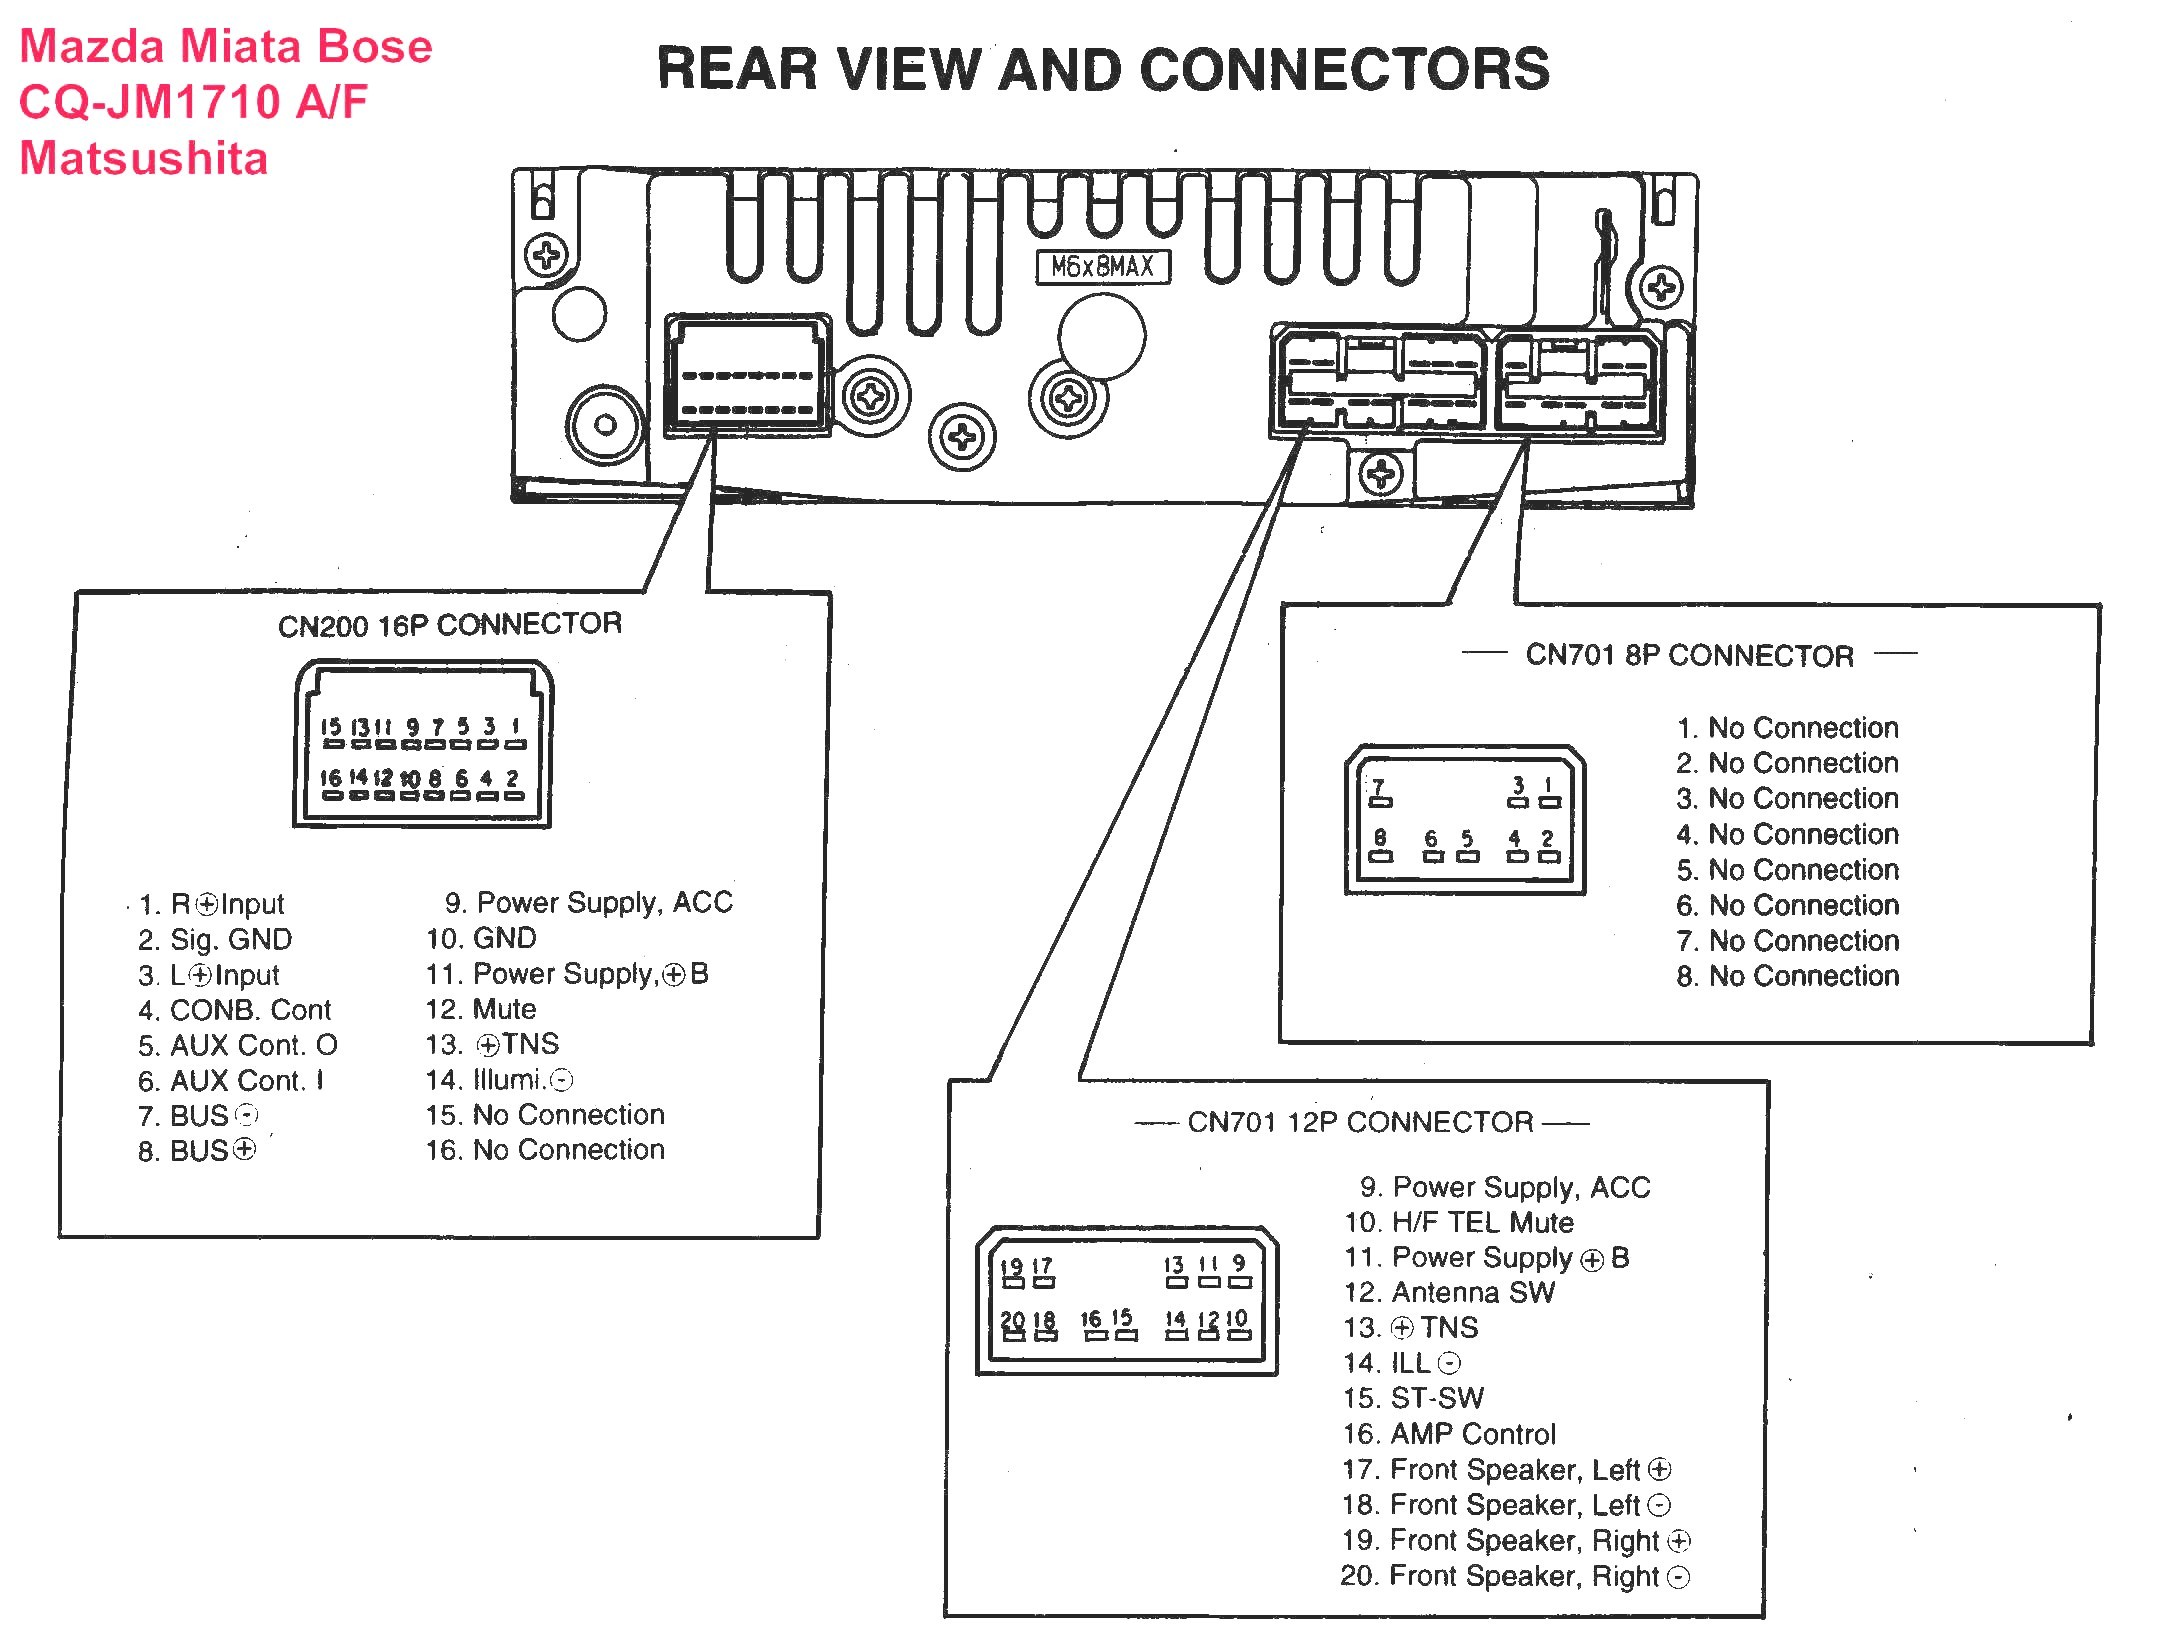 car speaker amp wiring diagram car diagram awesome kenwood car audio rh detoxicrecenze com kenwood marine amp wiring diagram kenwood 4 channel amp wiring diagram